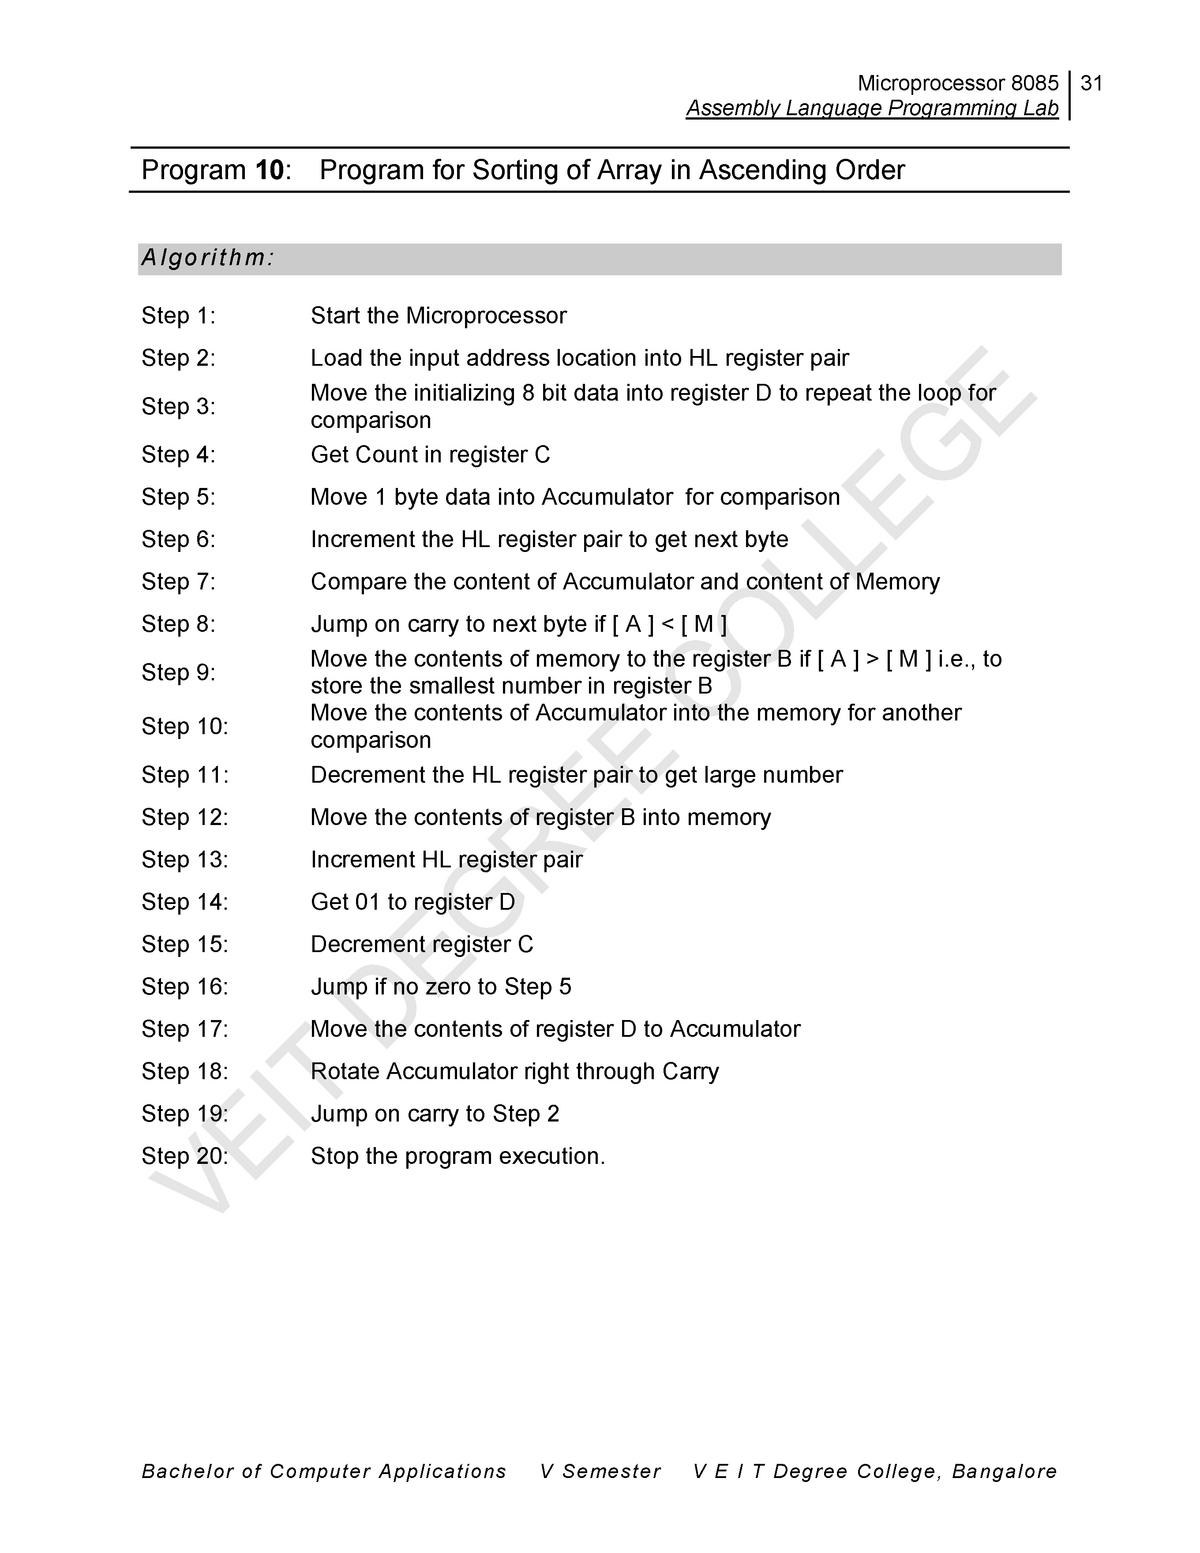 Program 10 - EL 205P: Pract  I Advanced microprocessors